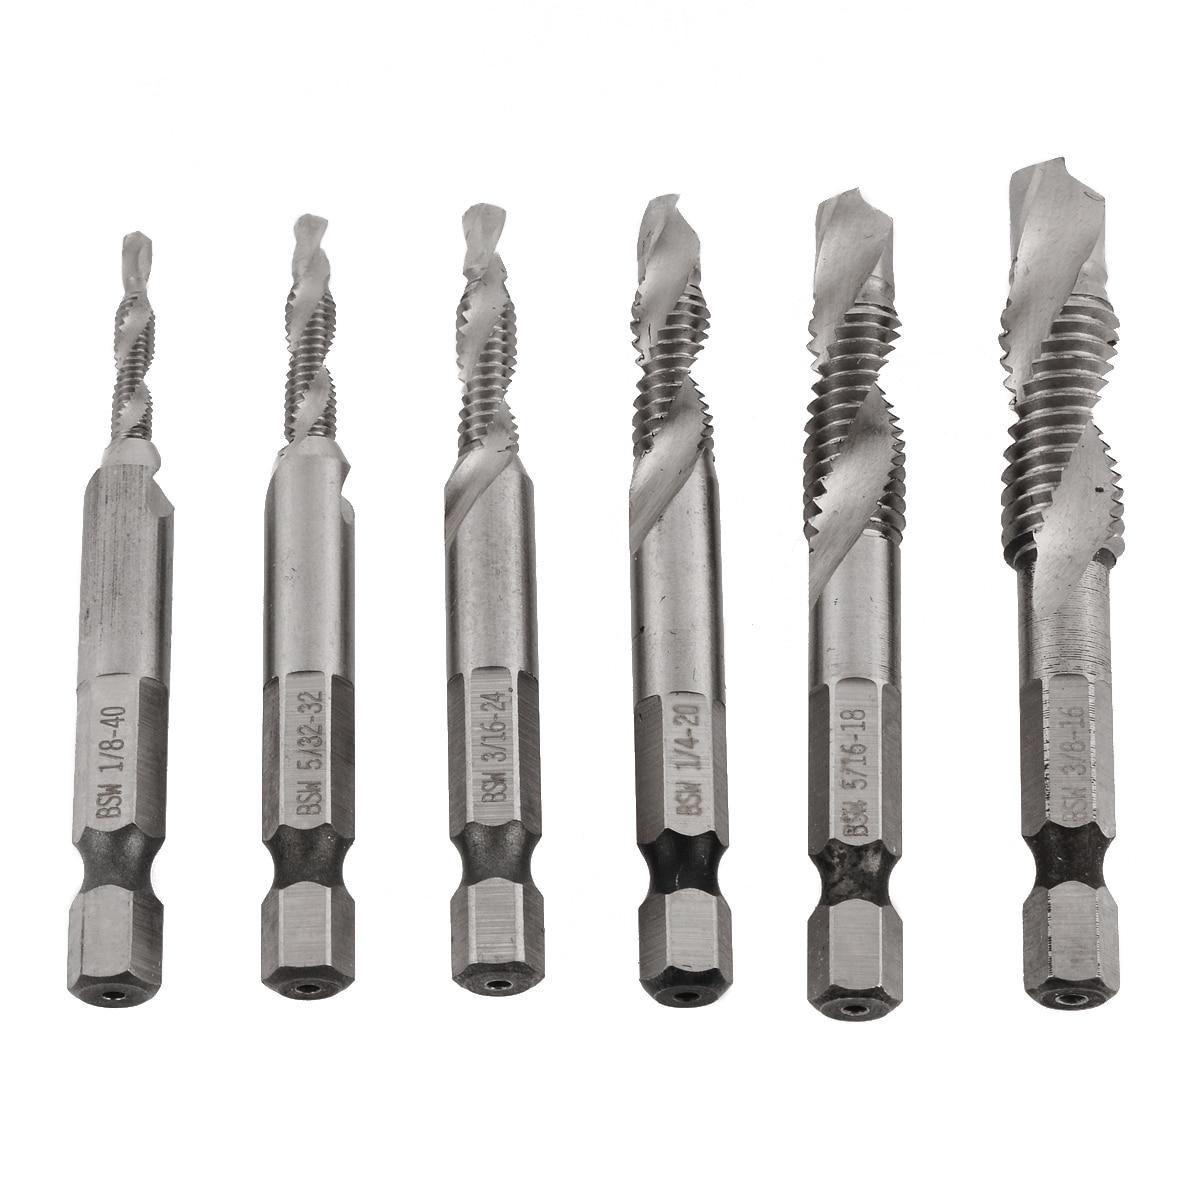 Metalworking Countersink Deburr Set Hex Shank Drill Tap Metric Combination Bits